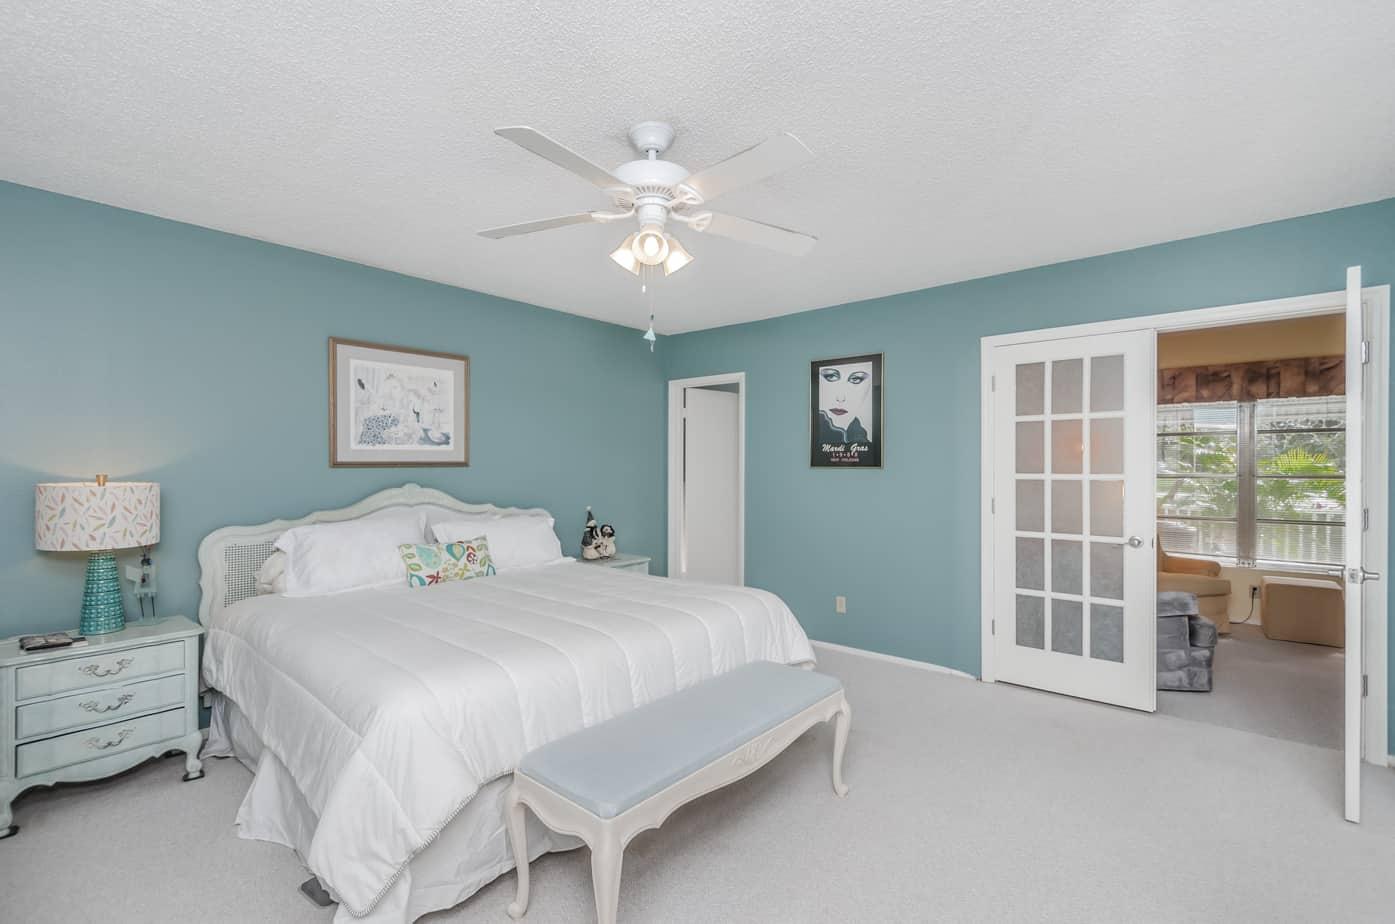 6-2285-Israeli-Dr-#17-Clearwater-Fl-33763-Master Bedroom1